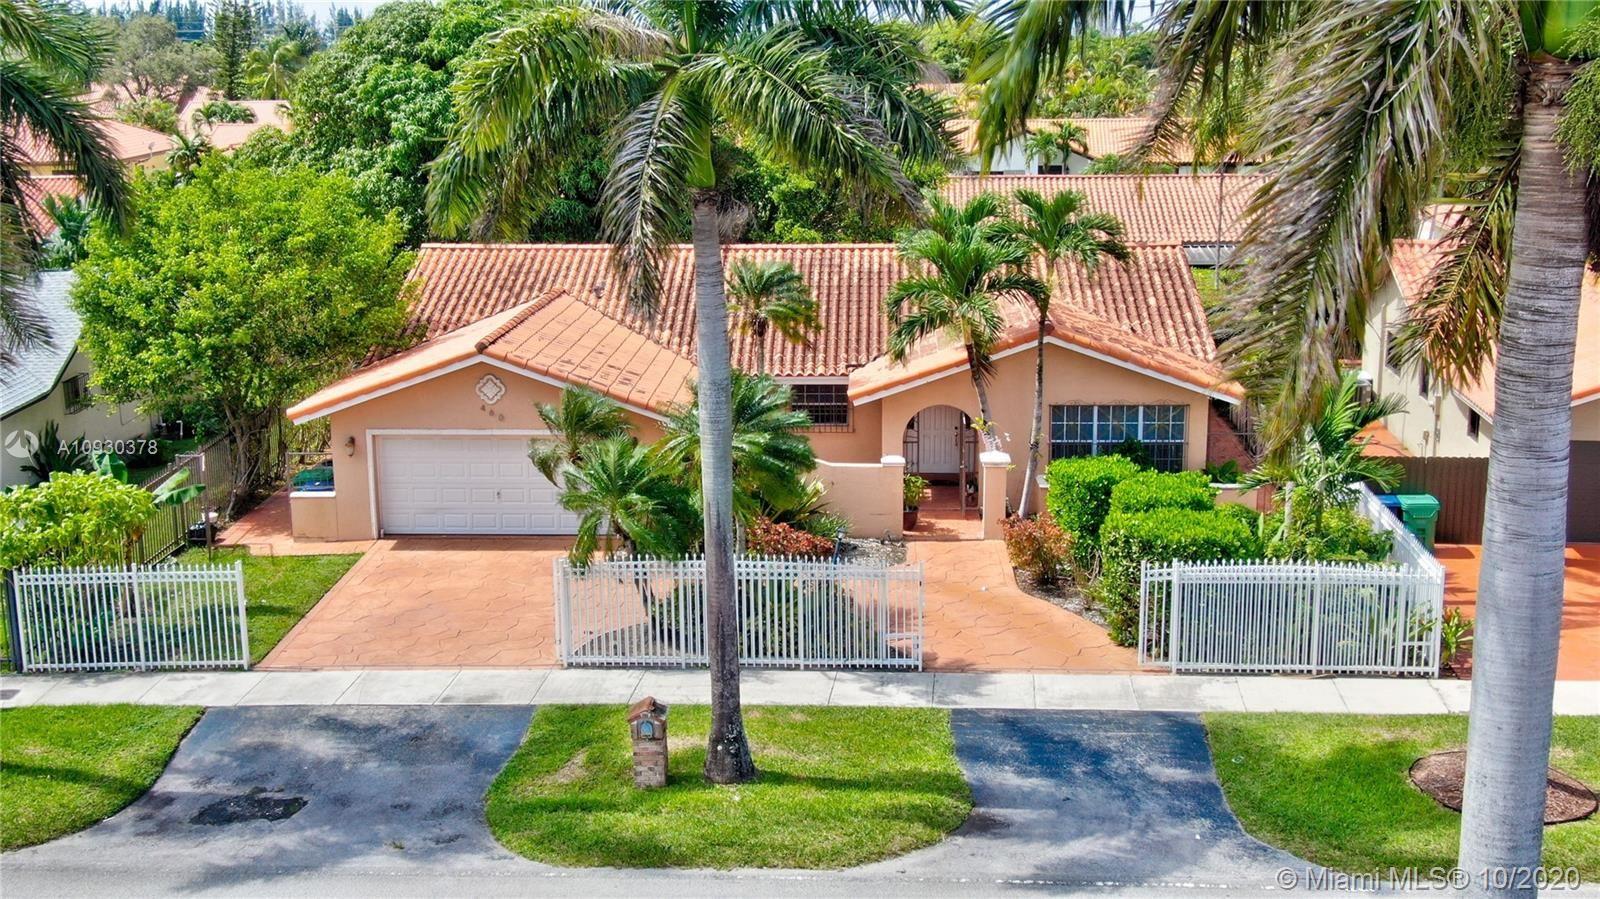 460 SW 132nd Ave, Miami, FL 33184 - #: A10930378